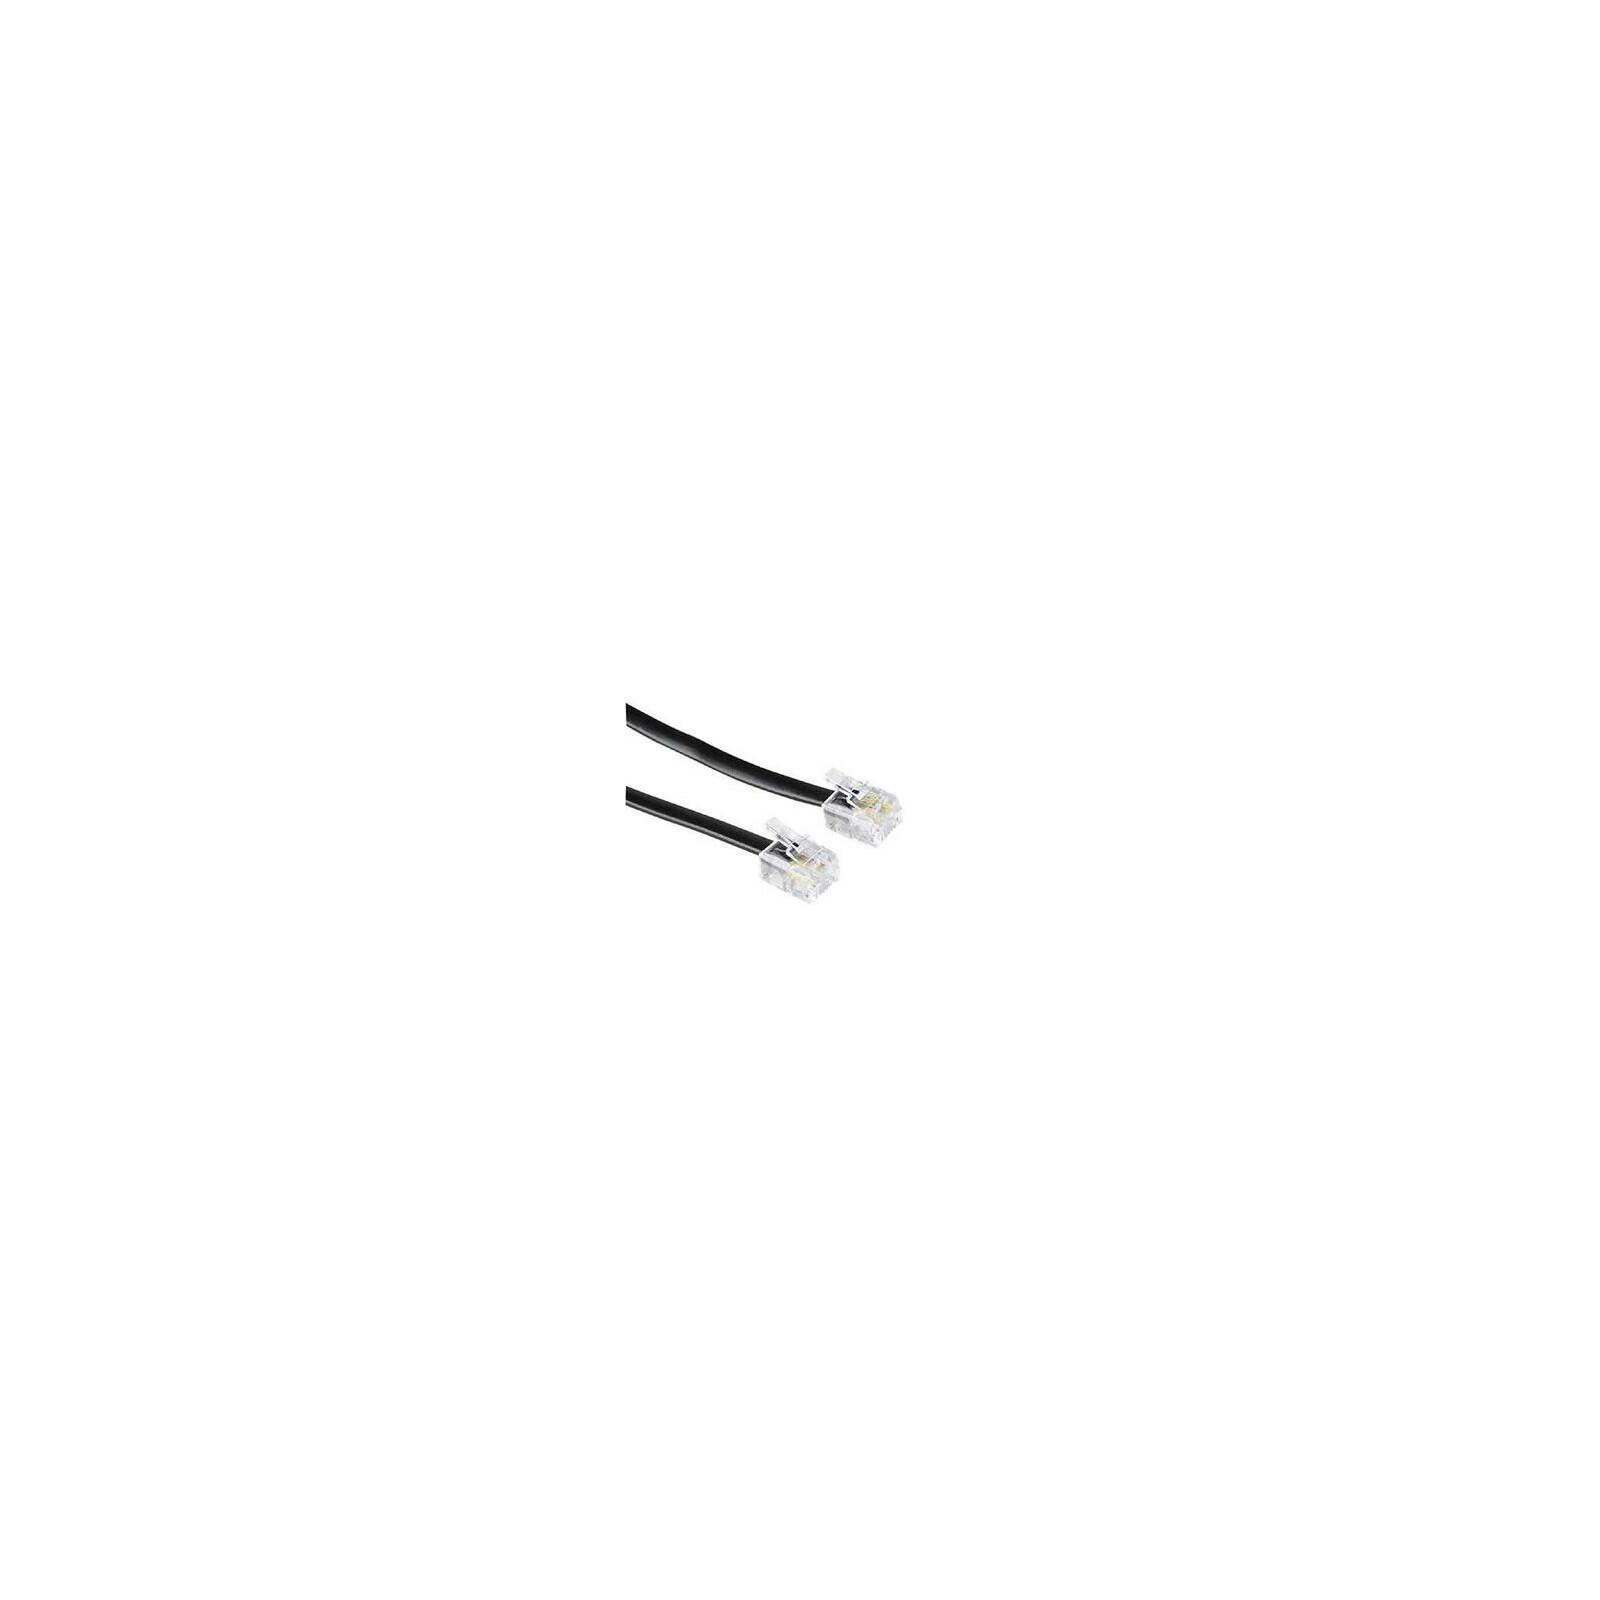 Hama 44931 Modularkabel, Stecker 6p4c - Stecker 6p4c, 10 m,